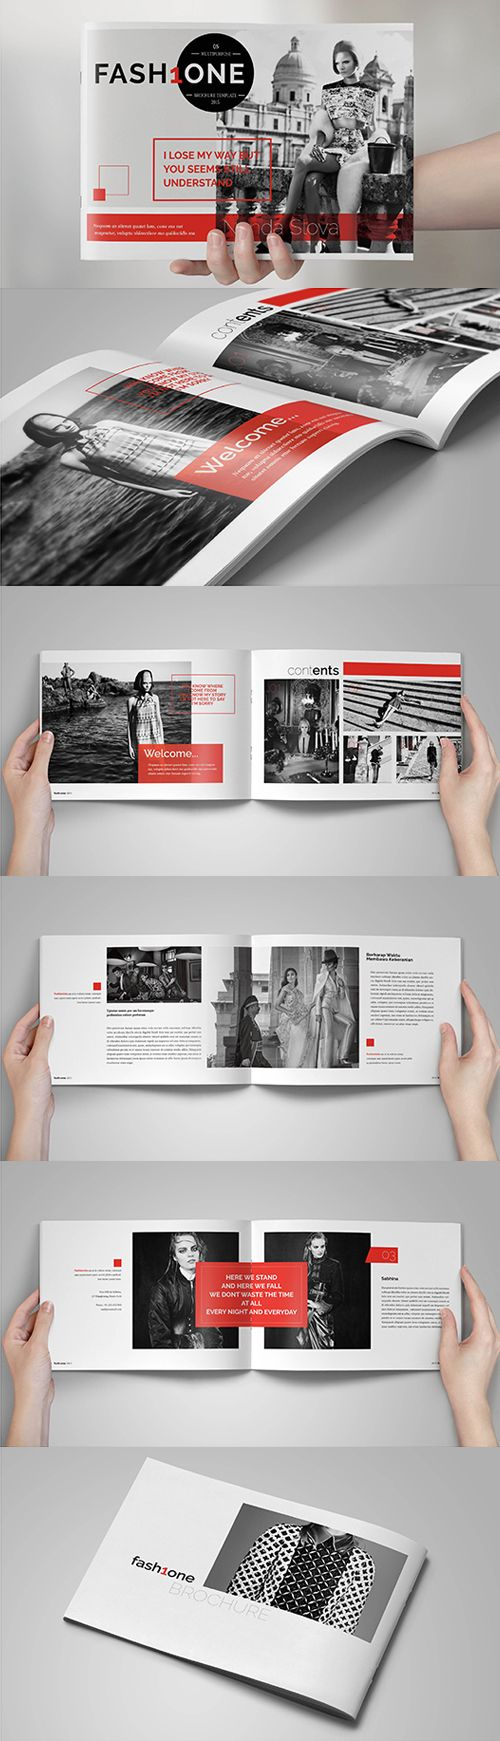 Multipurpose Fashion Brochure Template #brochuretemplates #catalog #annualreport